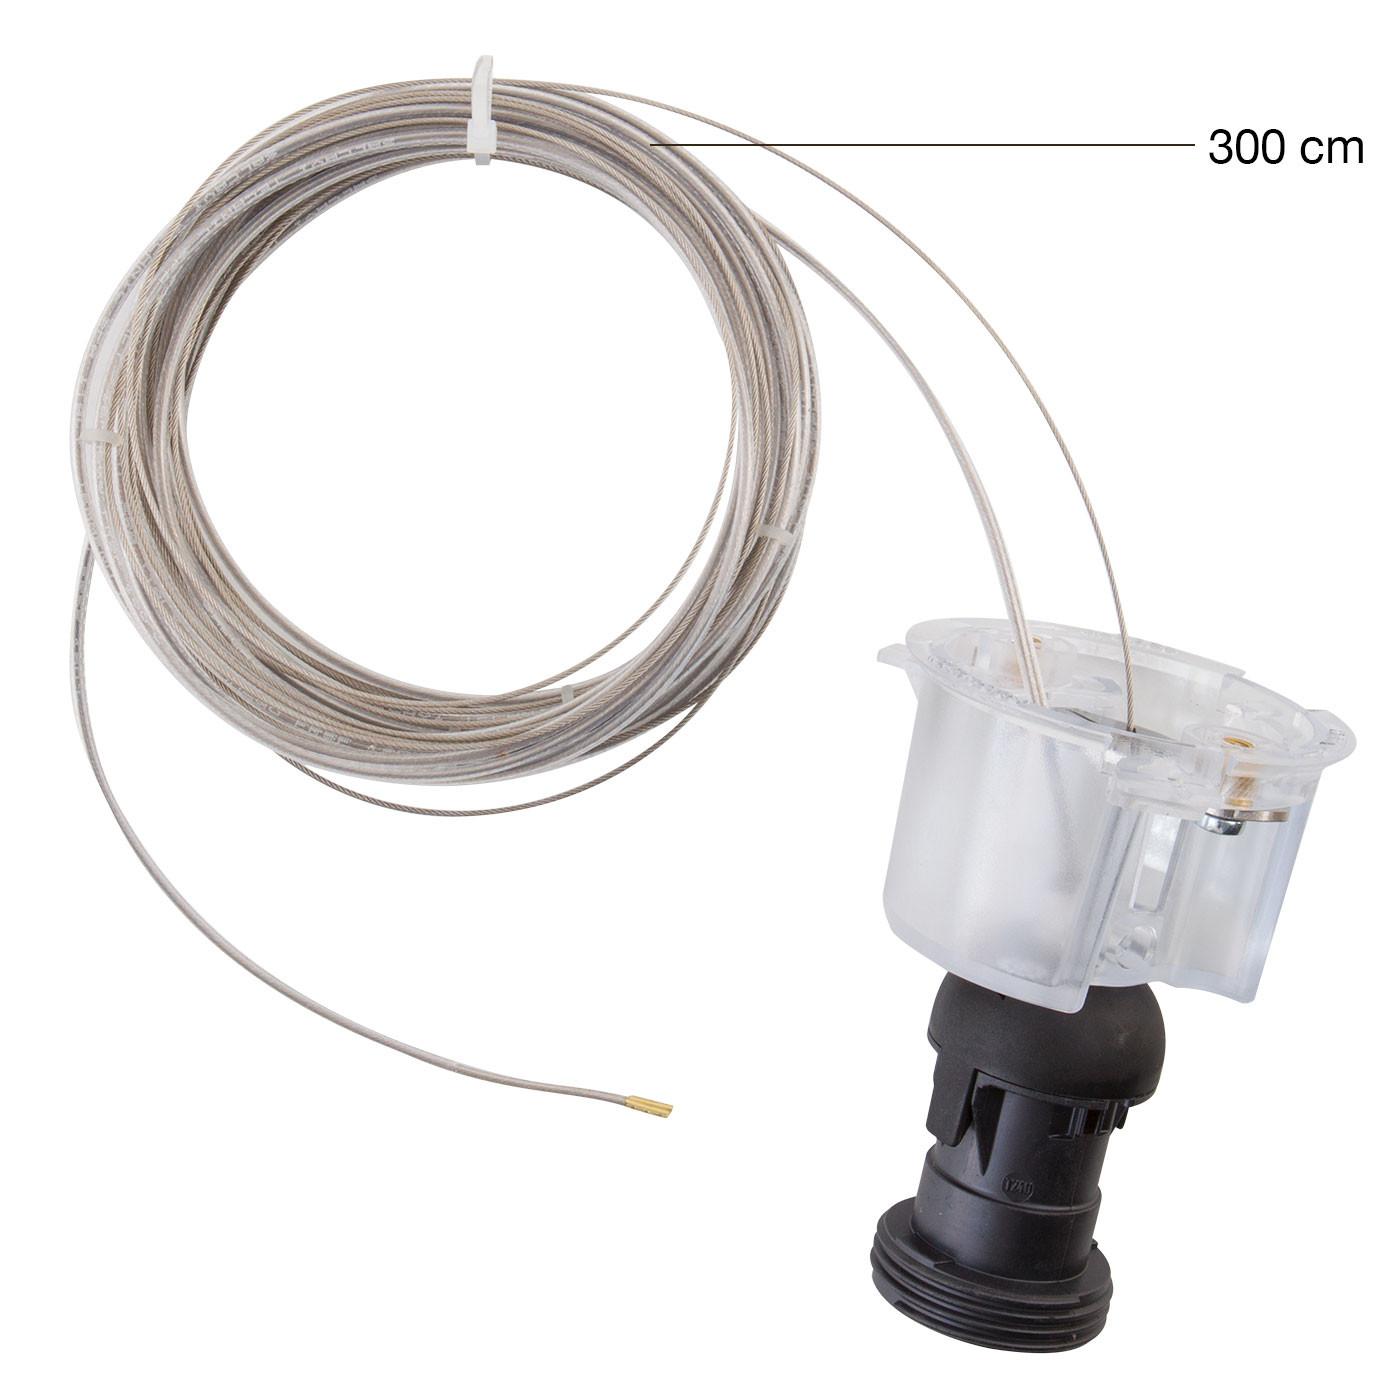 Foscarini Gregg Media / Grande Sospensione E27 Ersatzfassung mit Kabel